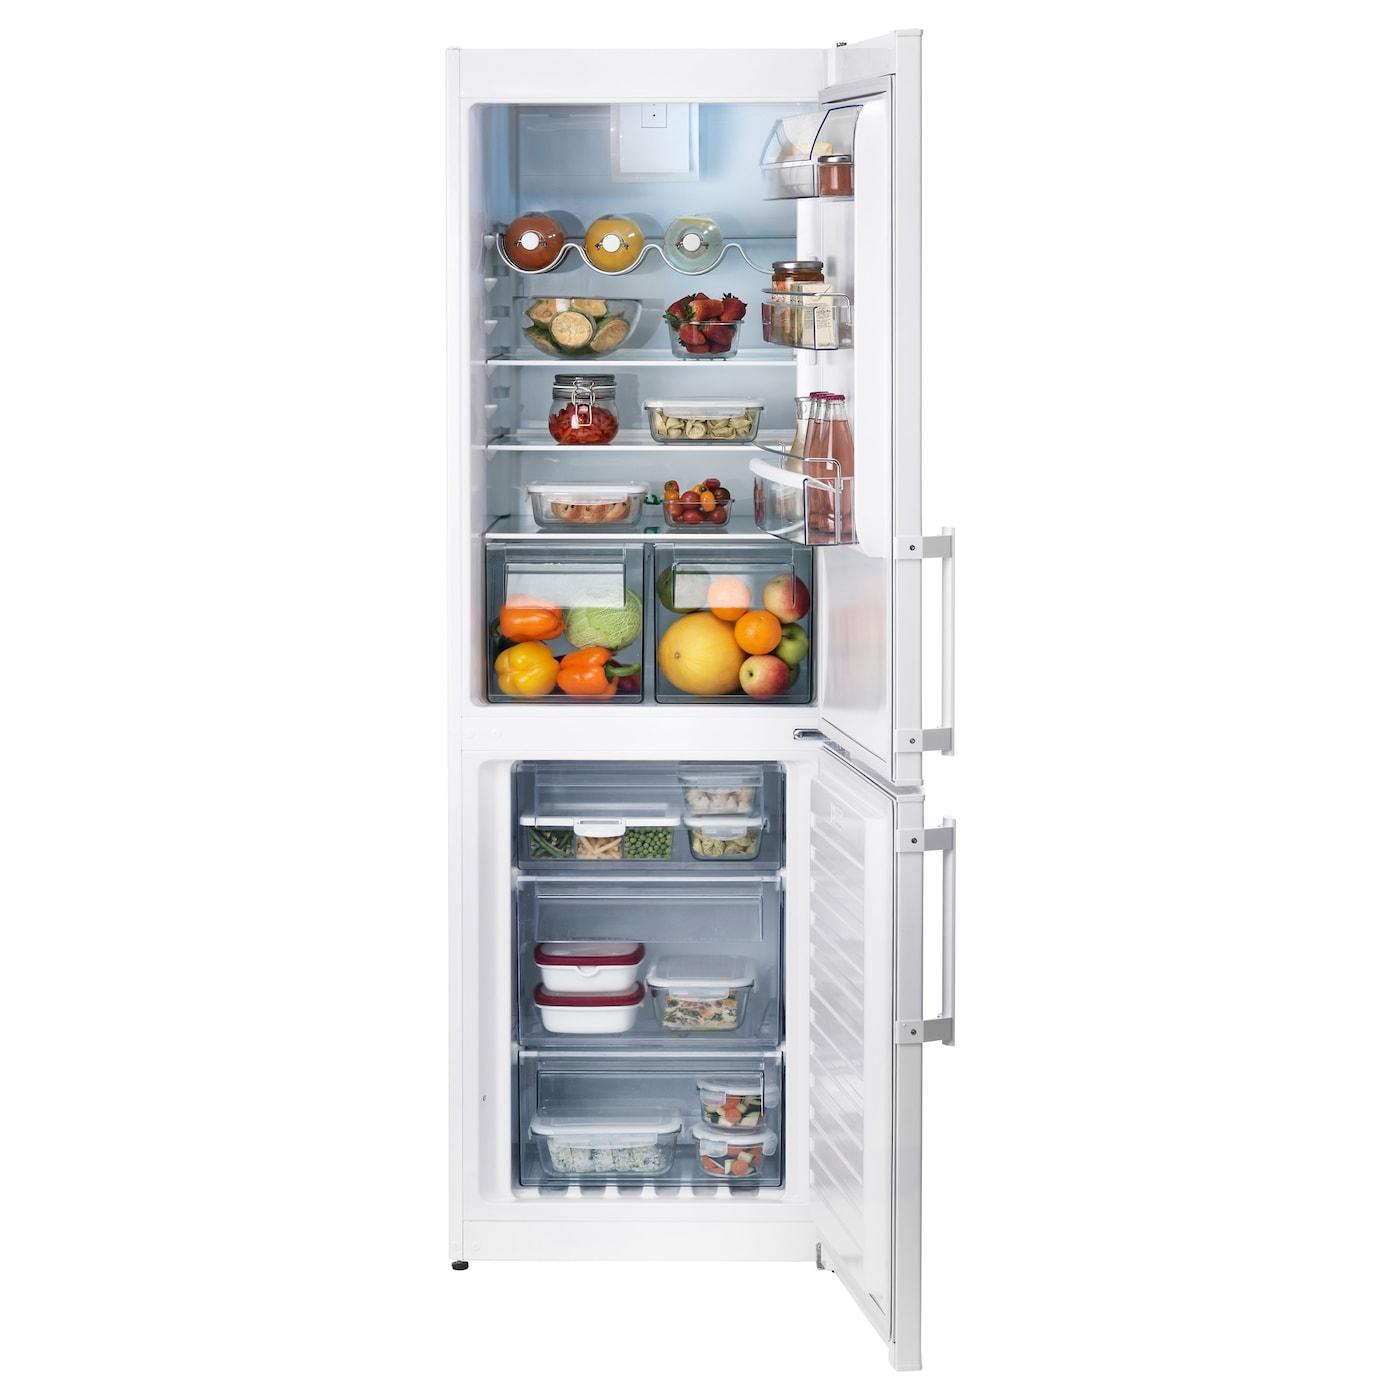 kyld fridge freezer a no frost white 220 91 l ikea. Black Bedroom Furniture Sets. Home Design Ideas